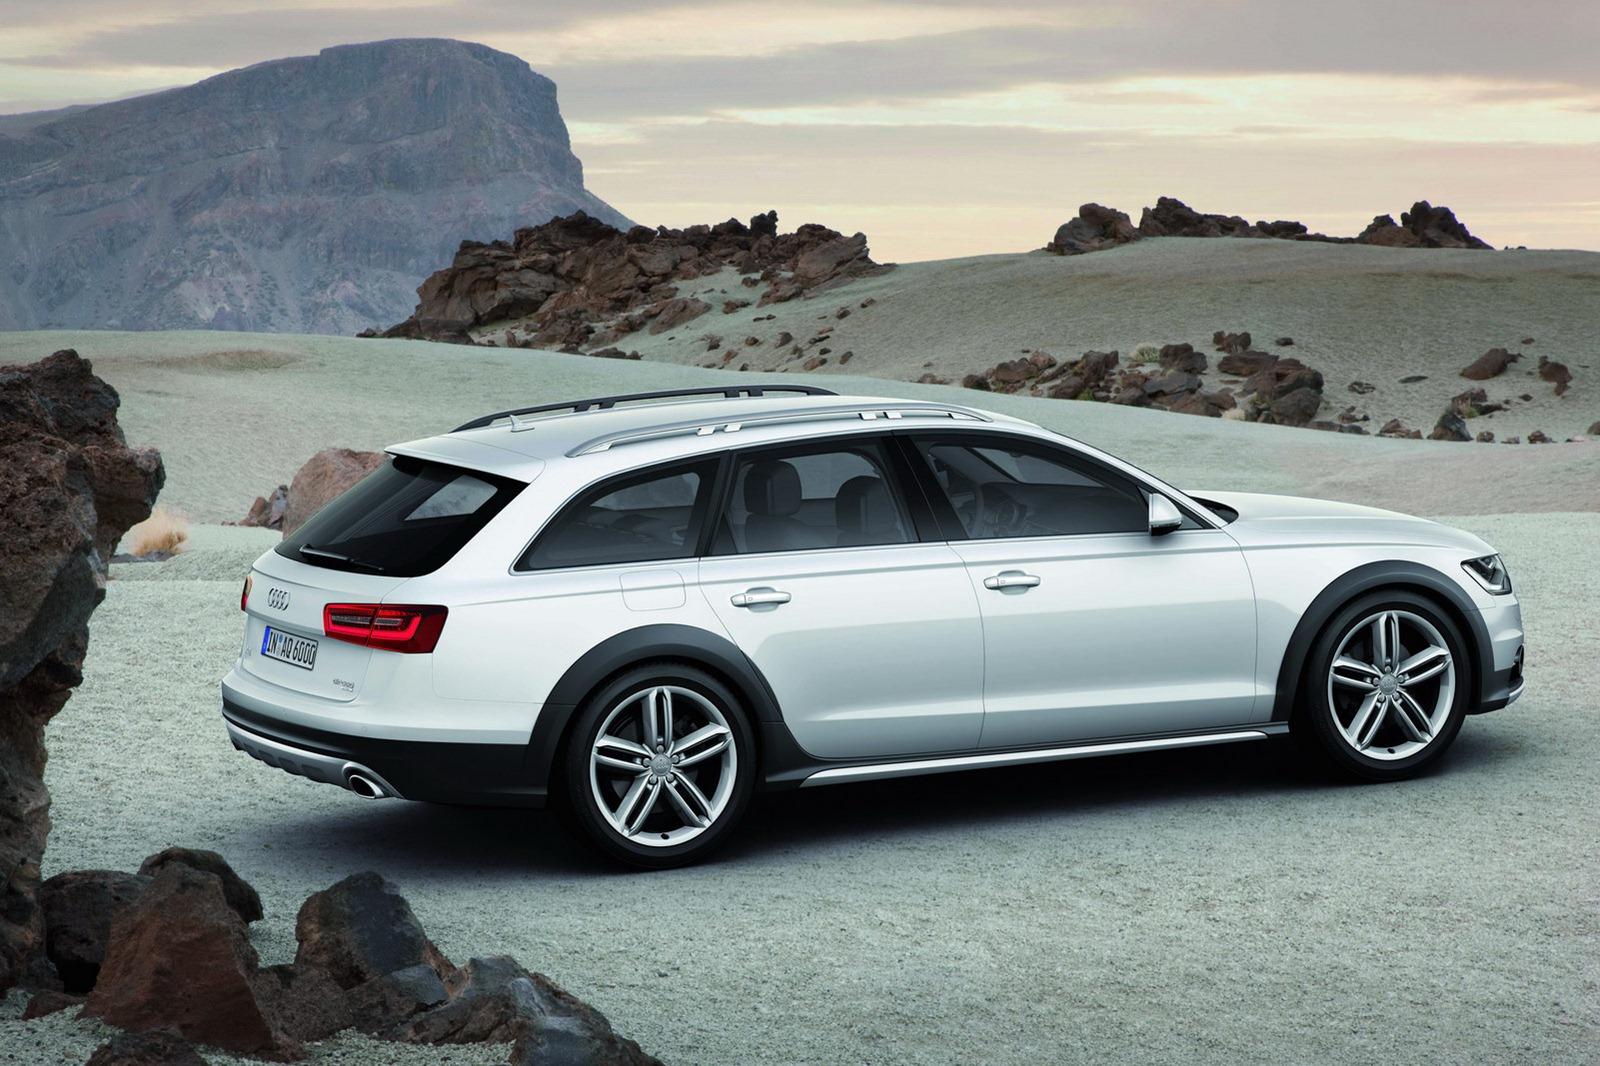 New 2013 audi a6 allroad unveiled autoevolution